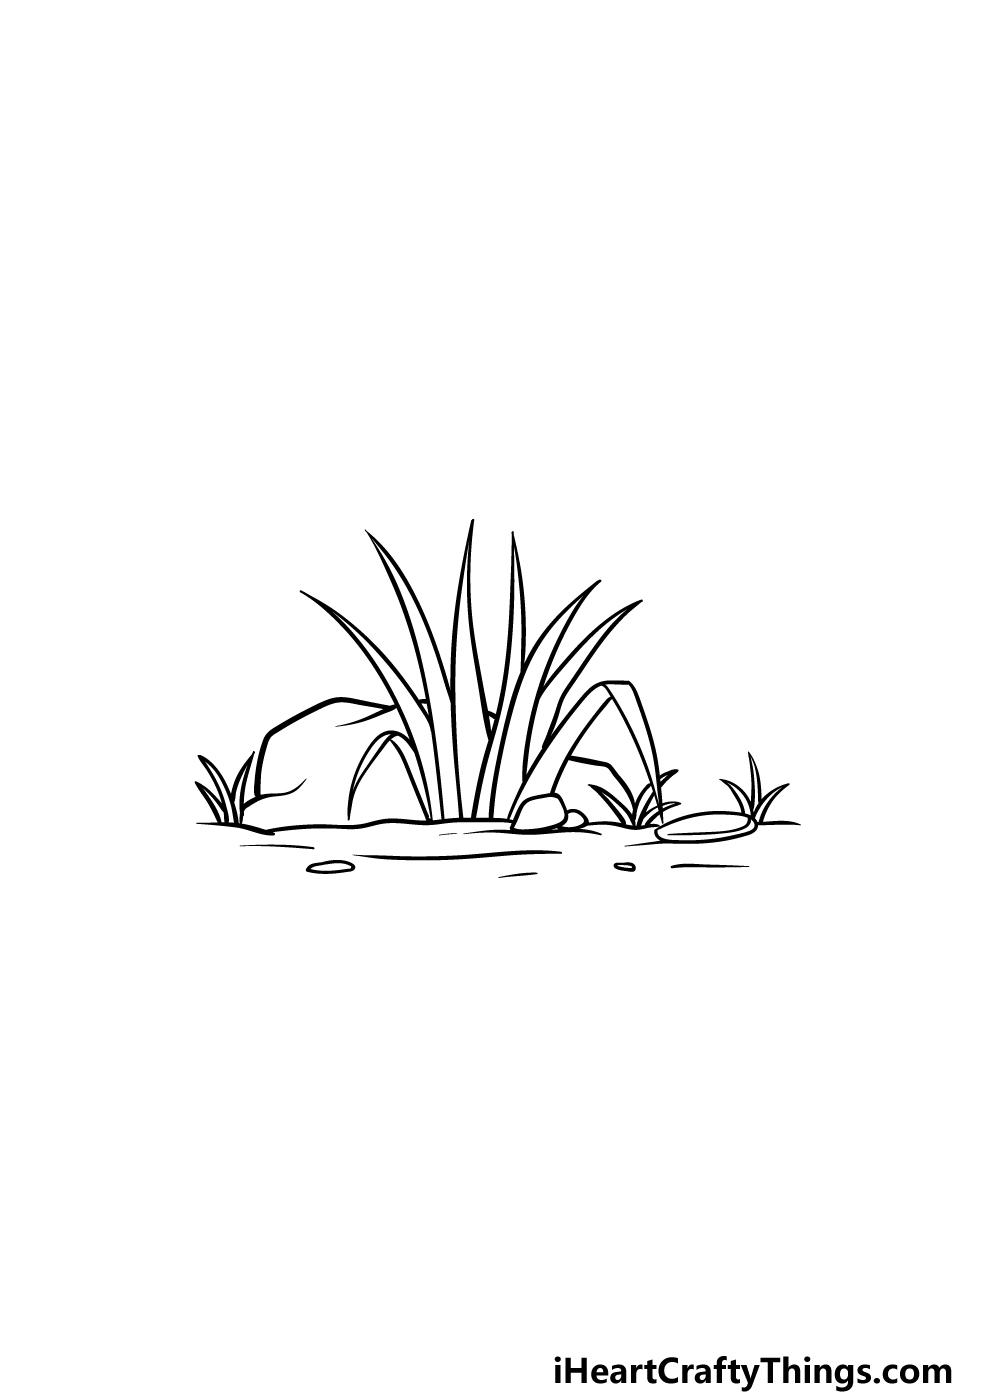 drawing grass step 4